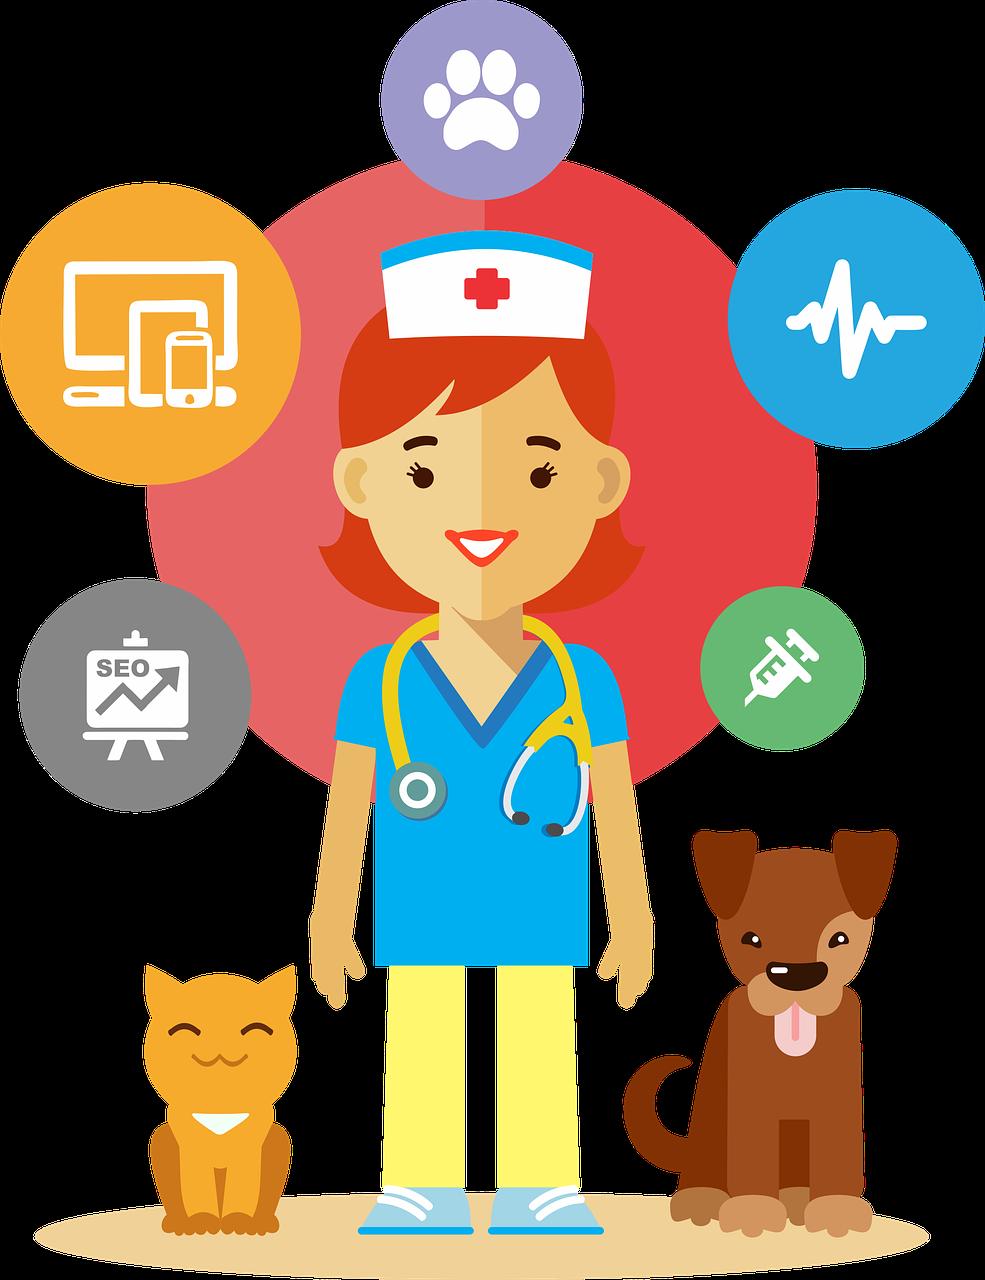 Veterinarian clipart veteranarian. About us centre animal